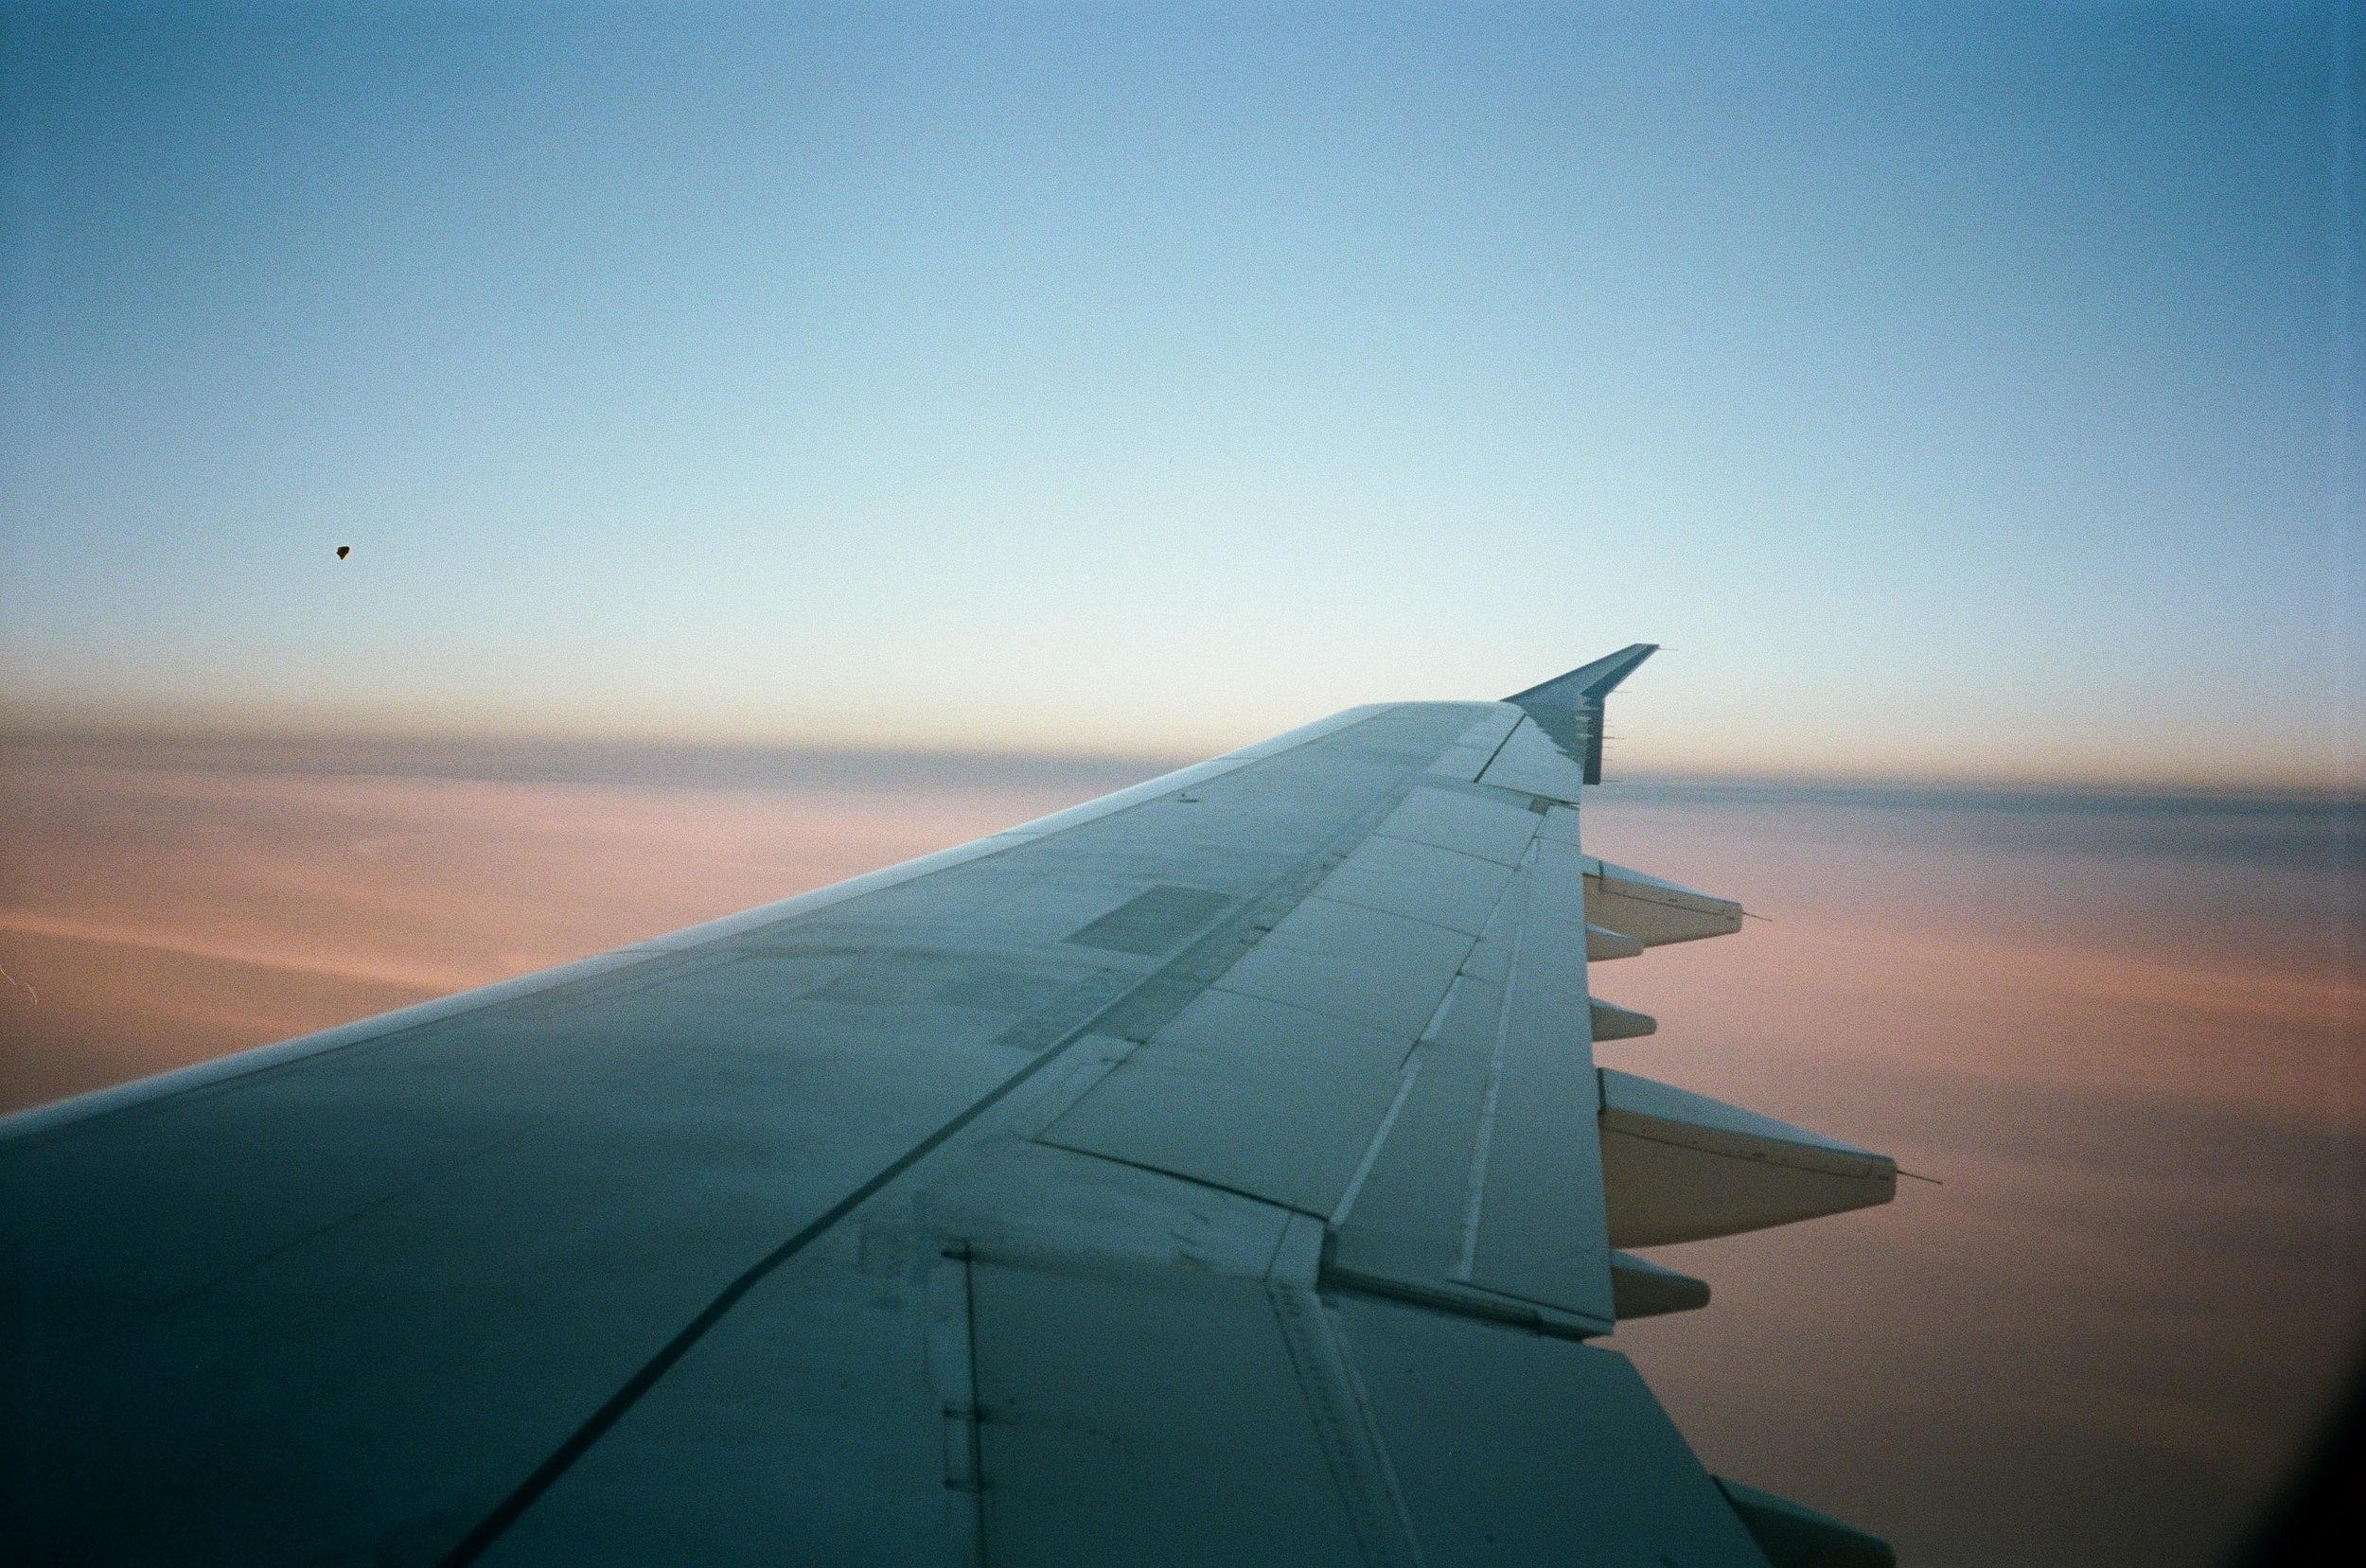 Plane Sunset @yentlt.jpg